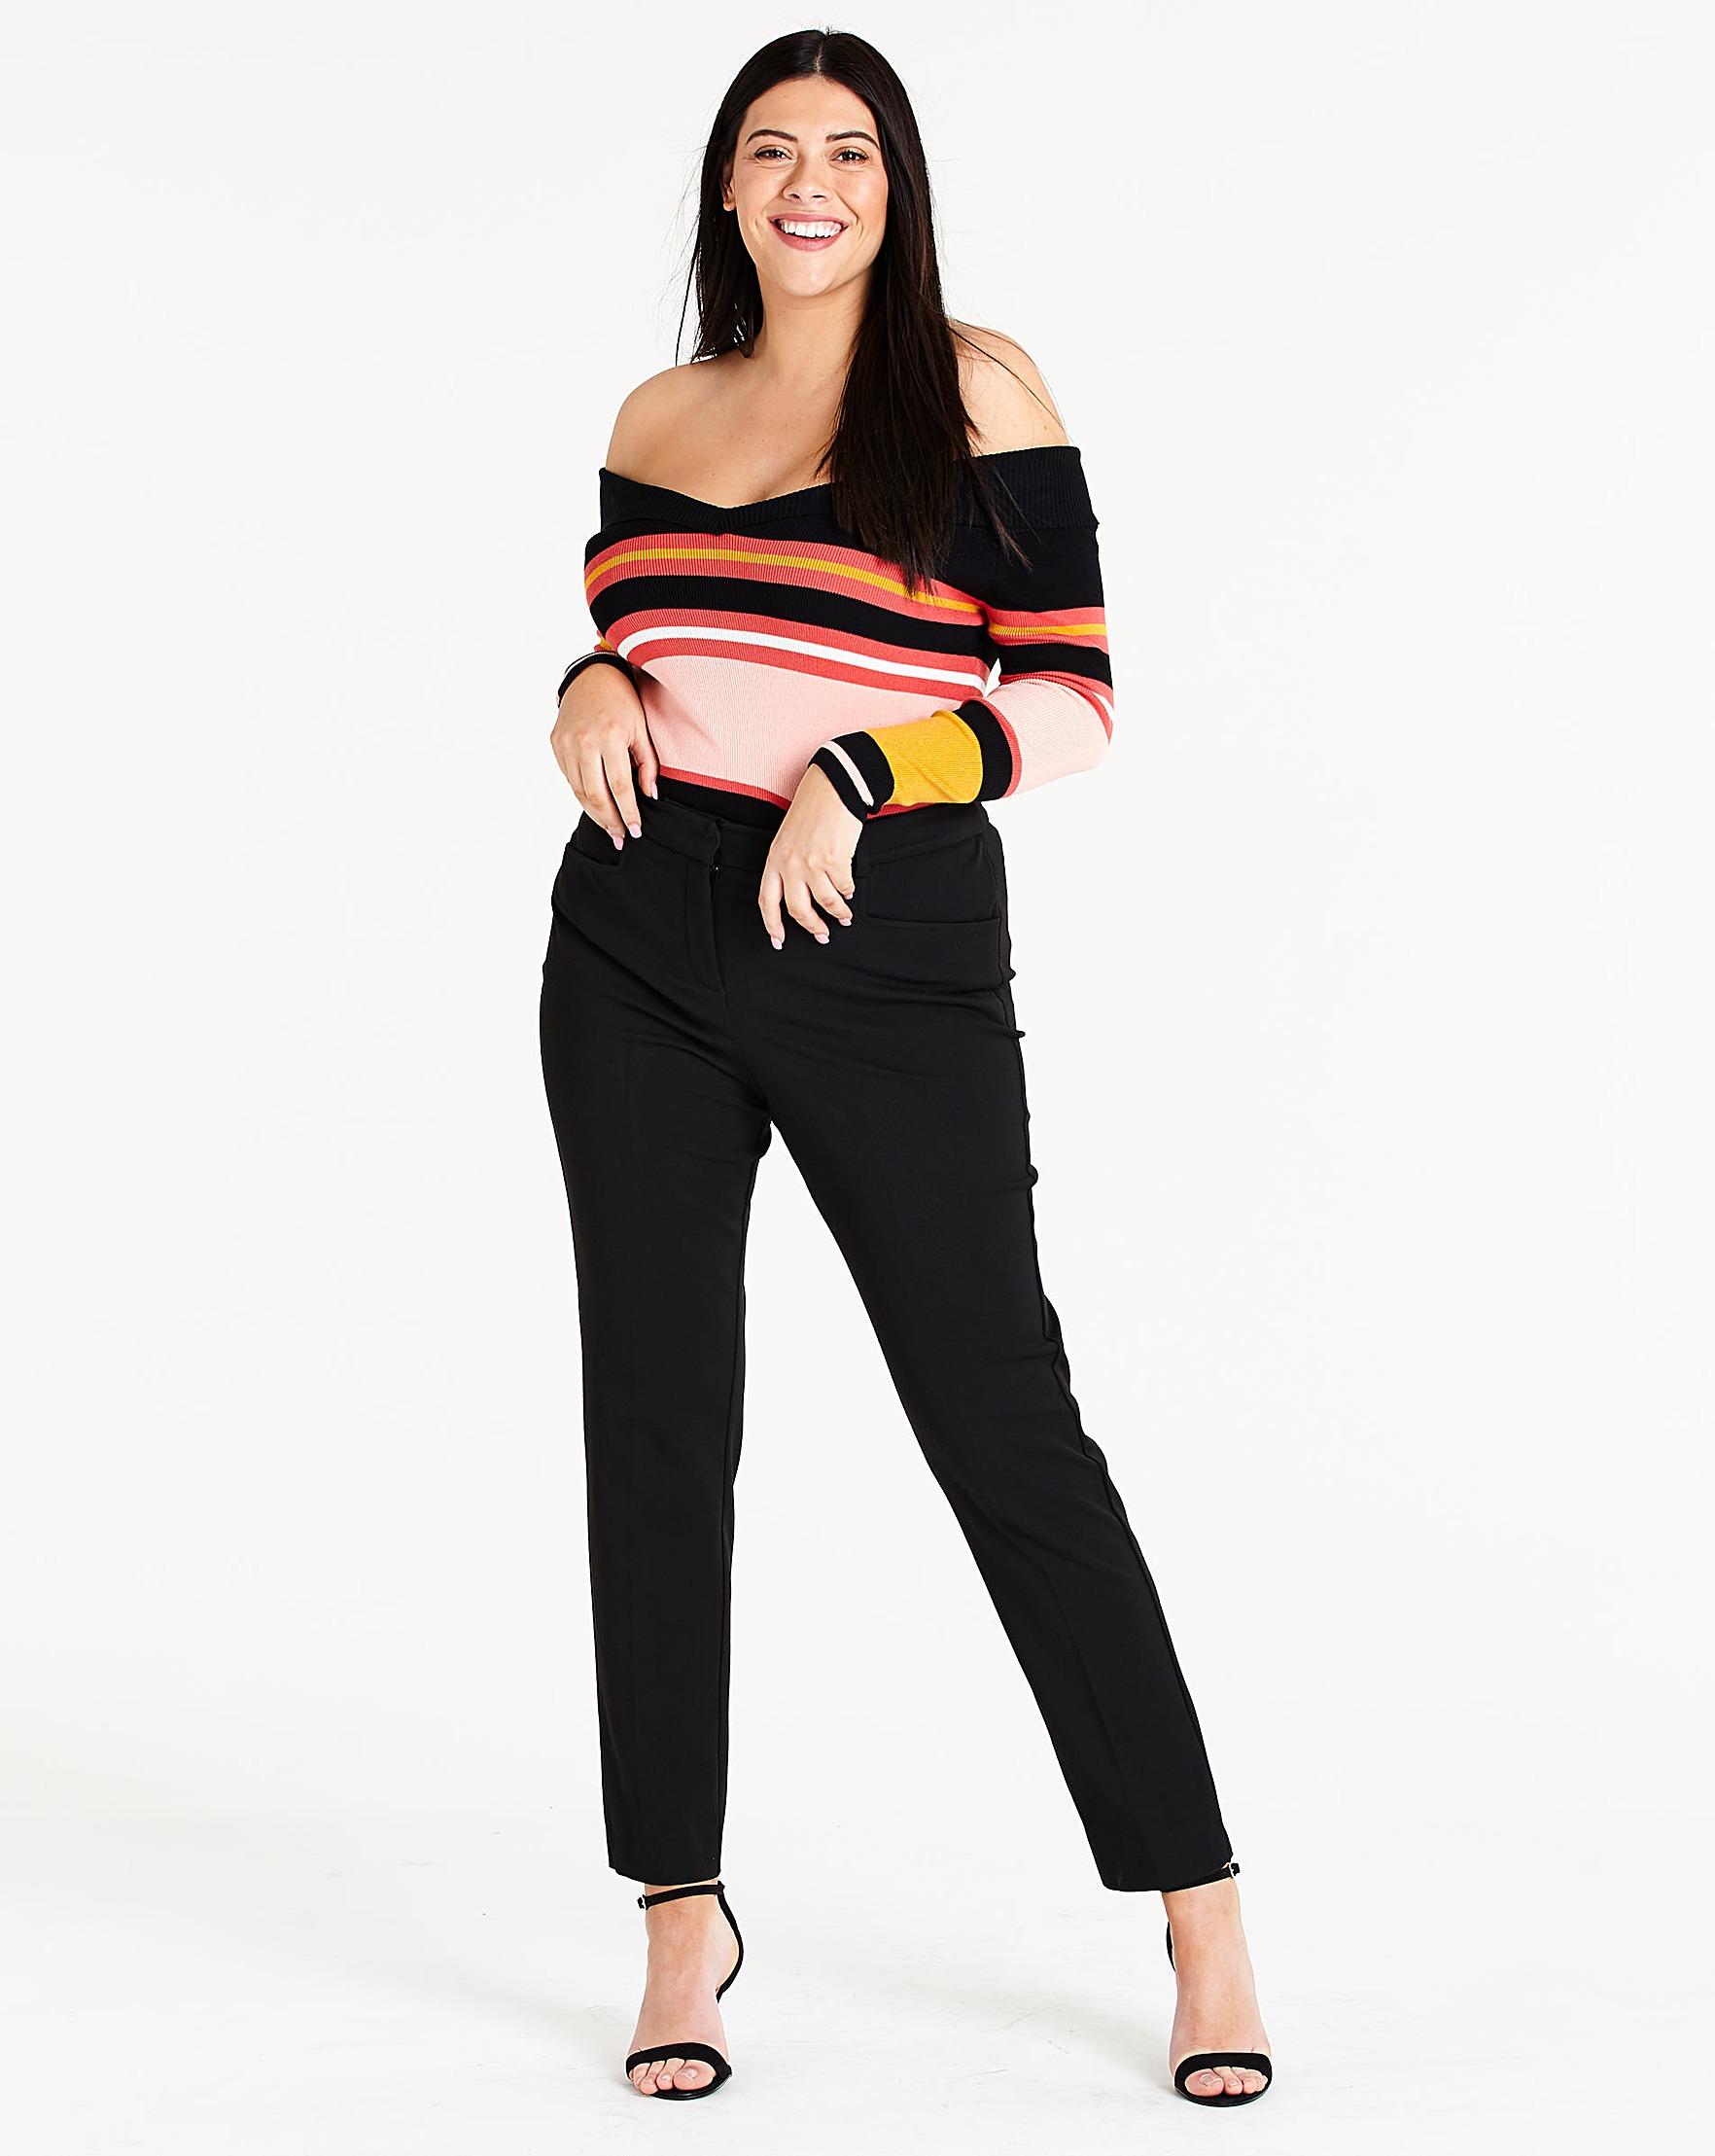 c8e249bac229 Black Everyday Kate Slim Leg Trousers Regular